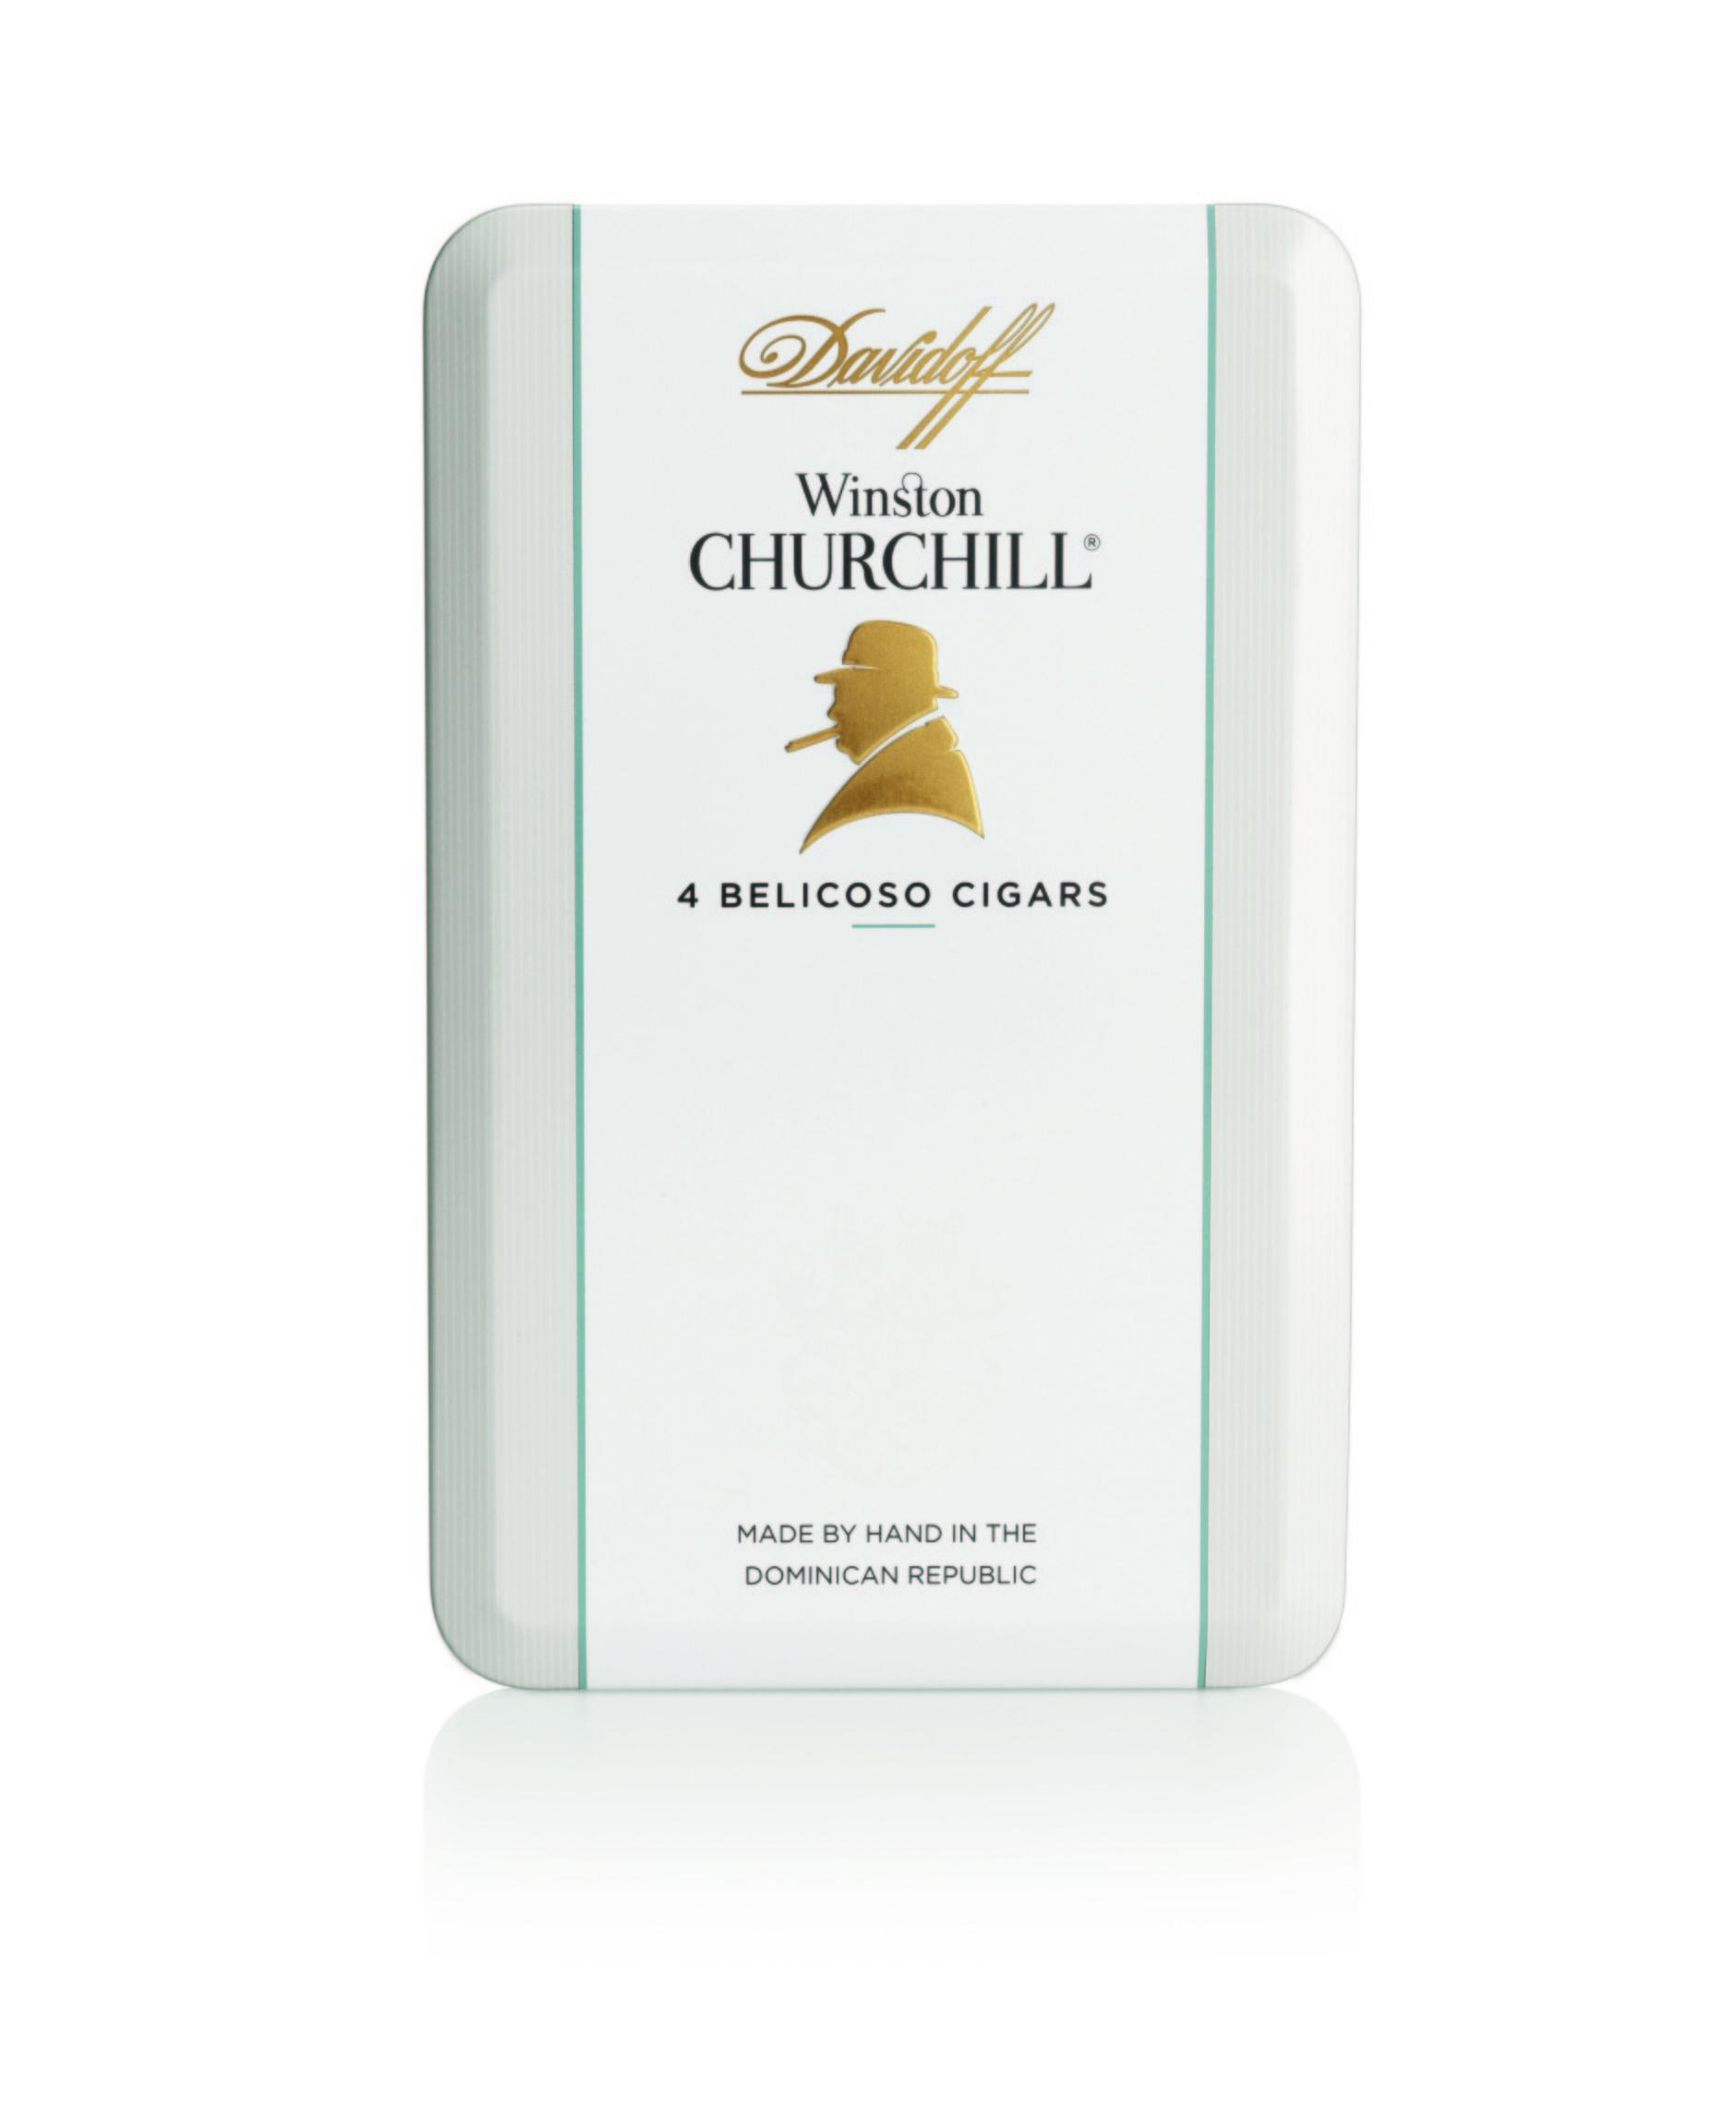 Davidoff Winston Churchill Belicoso tin